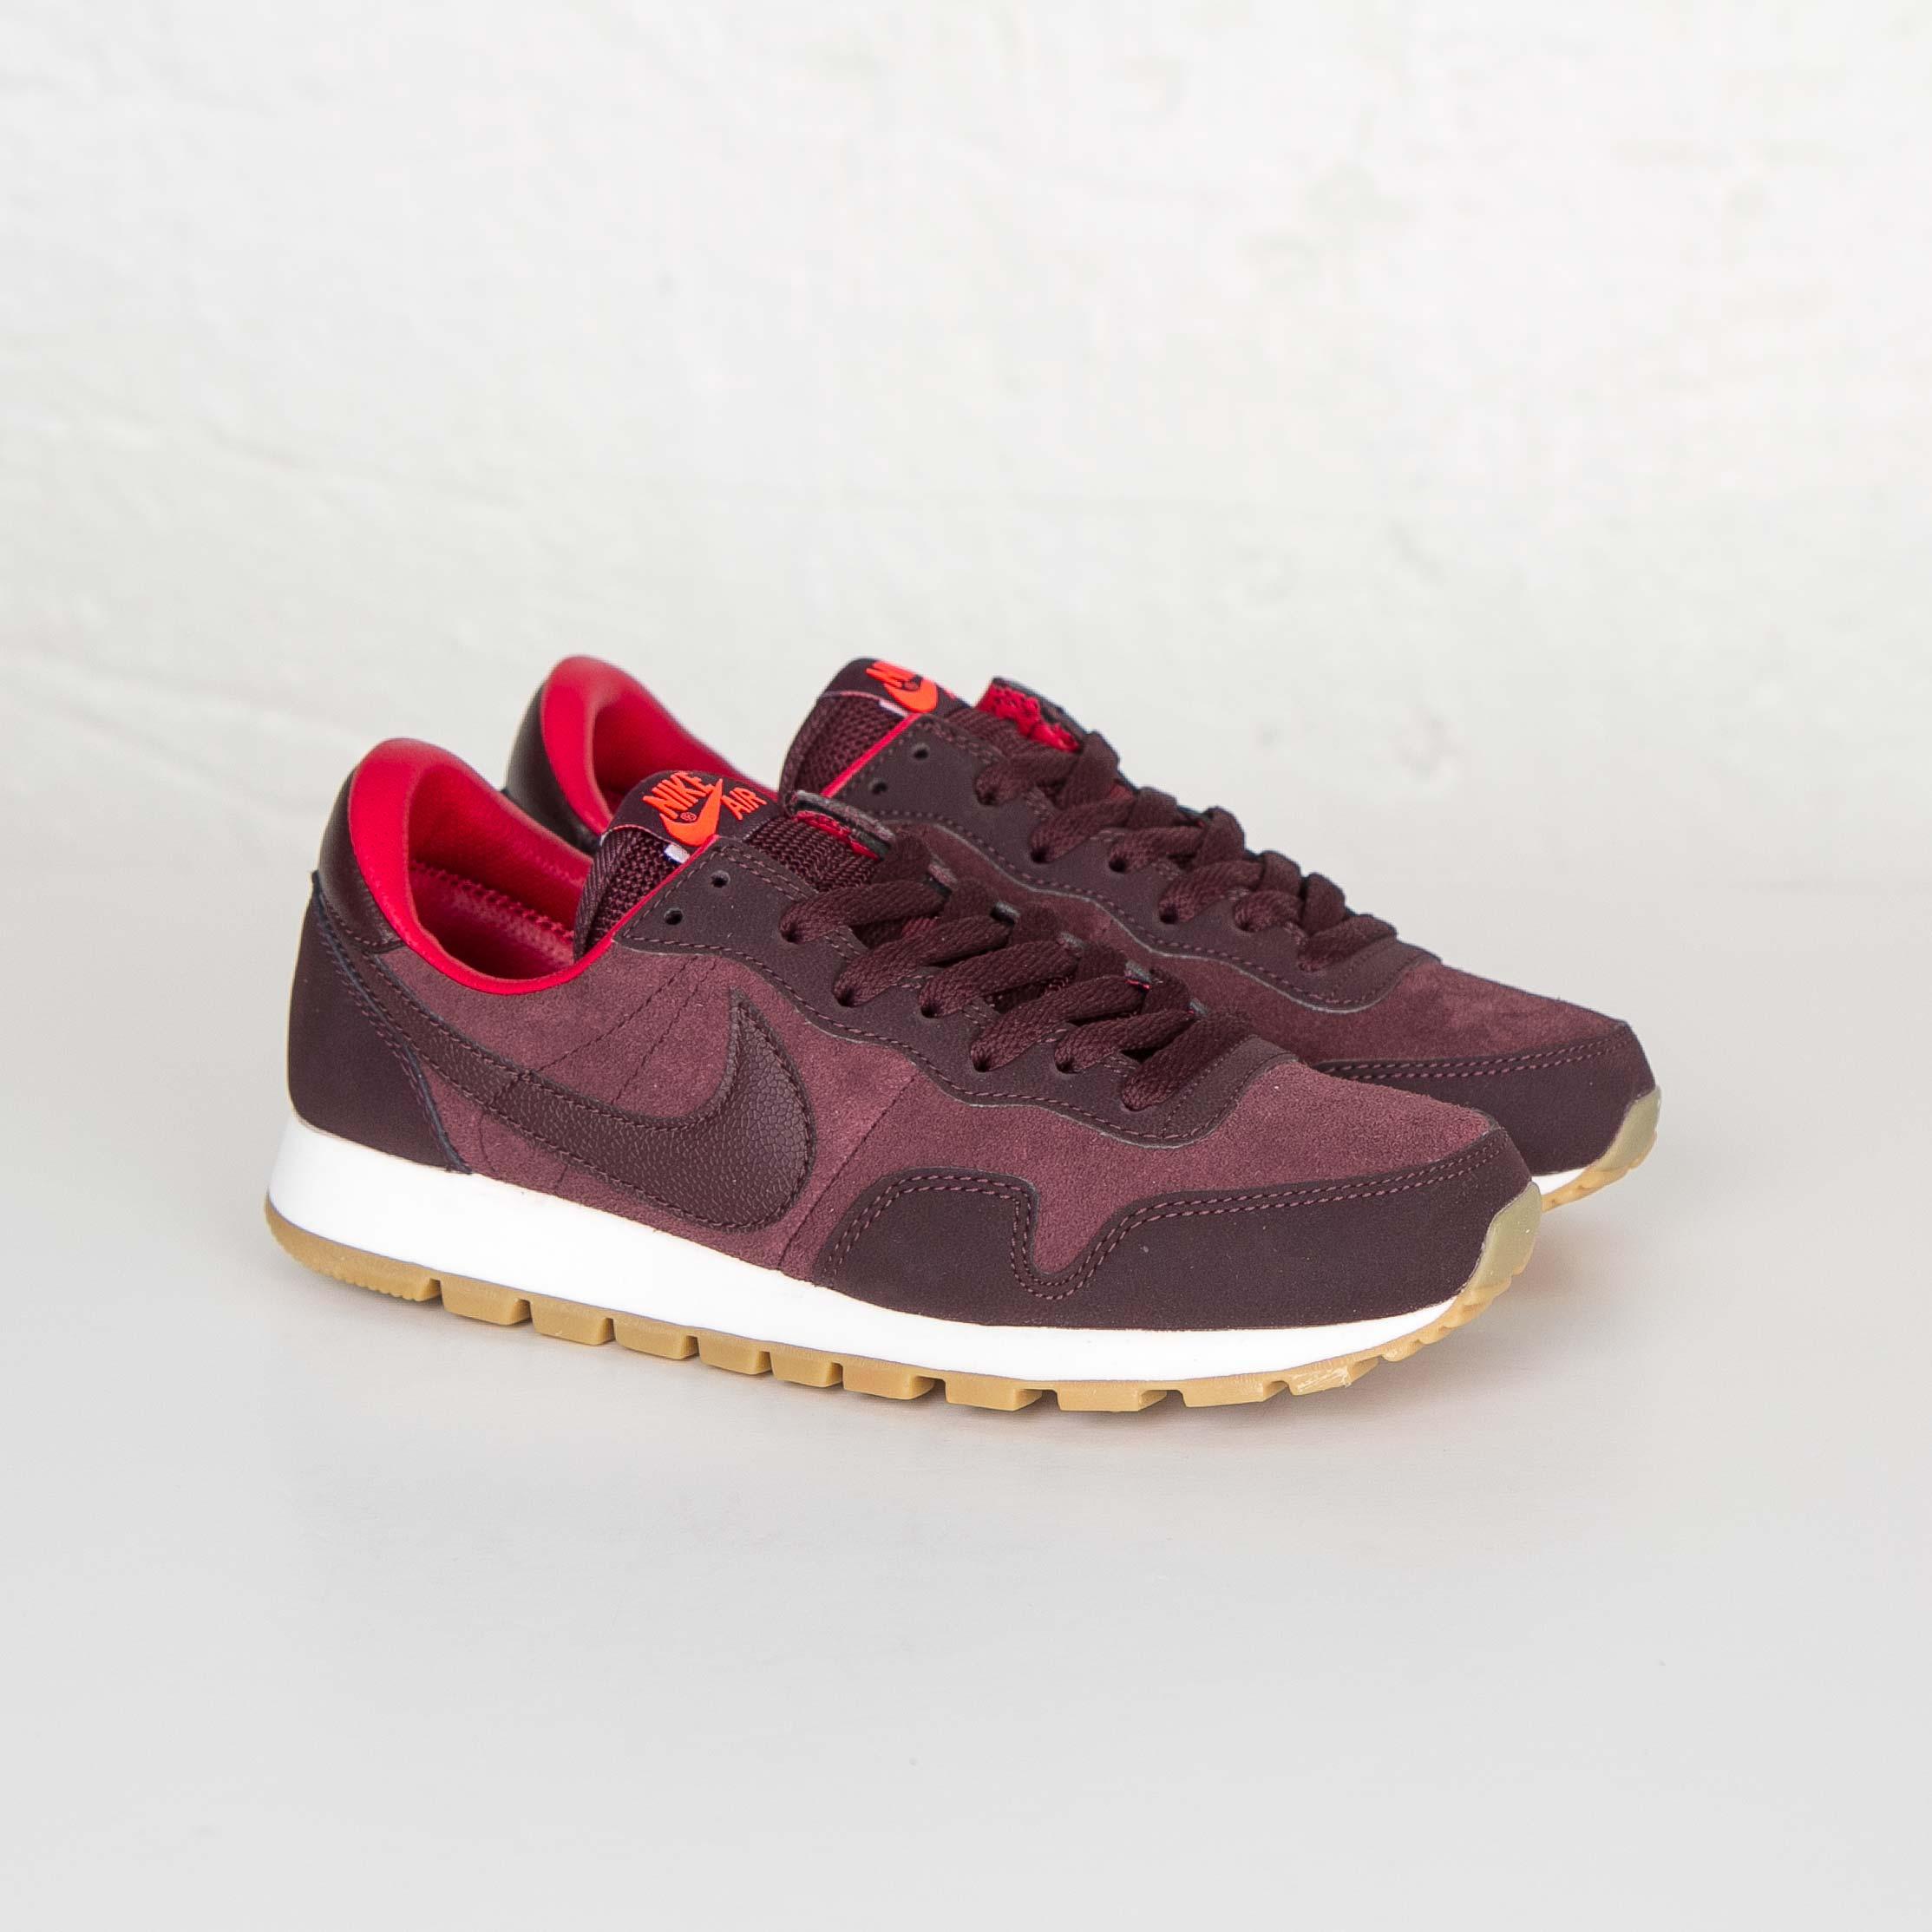 Nike Wmns Air Pegasus 83 Leather 749666 601